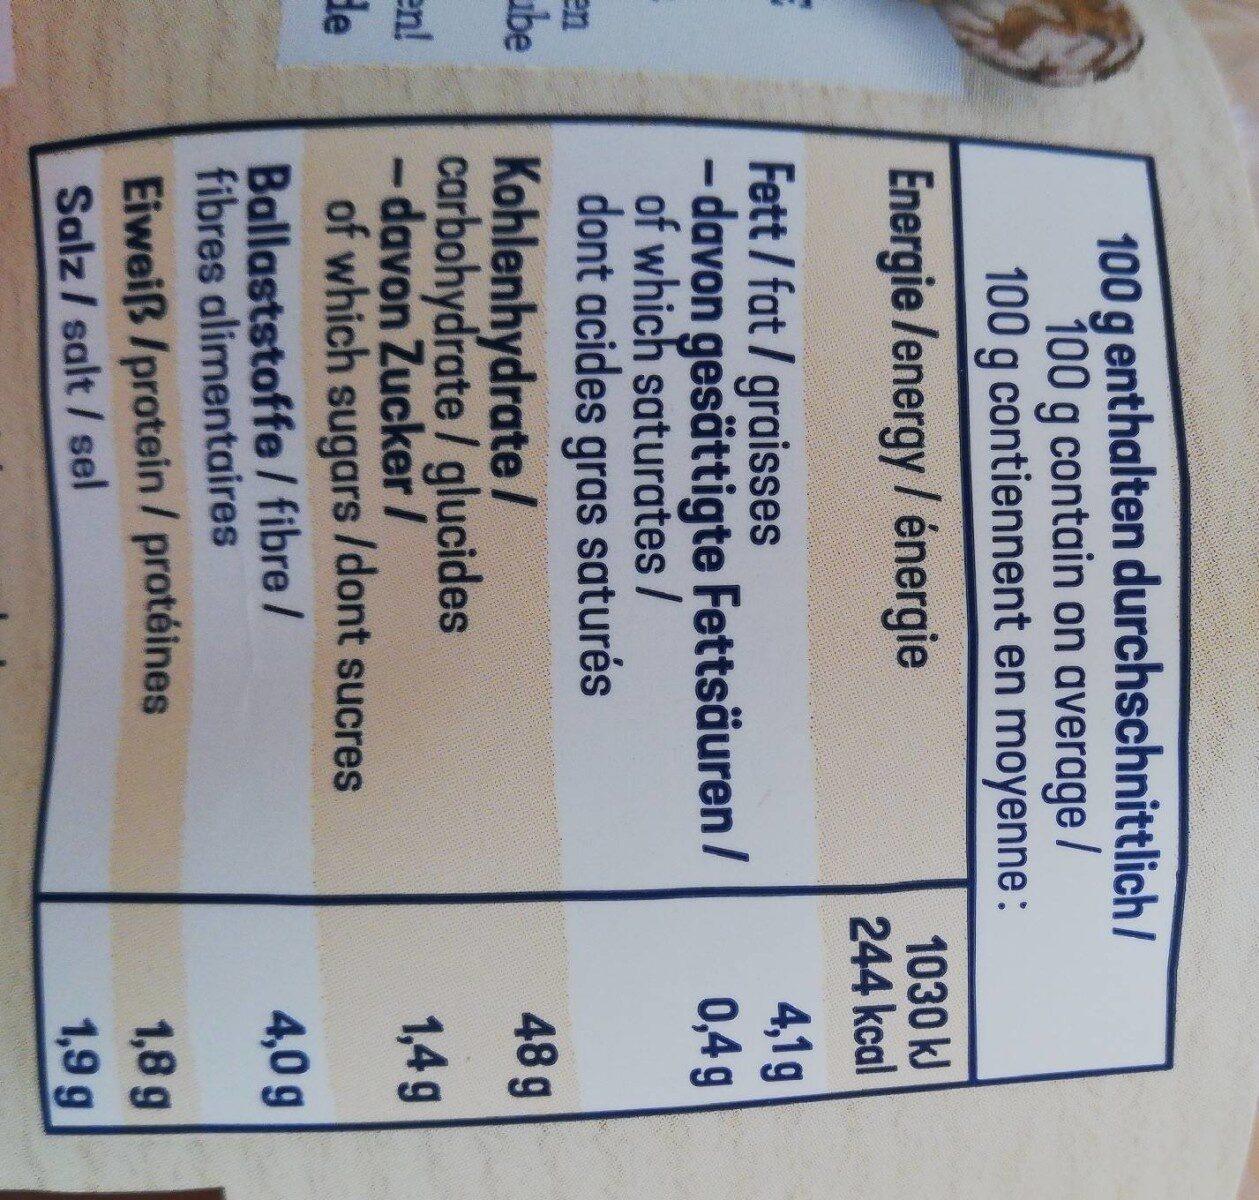 Laugenstangen glutenfrei - Nährwertangaben - de